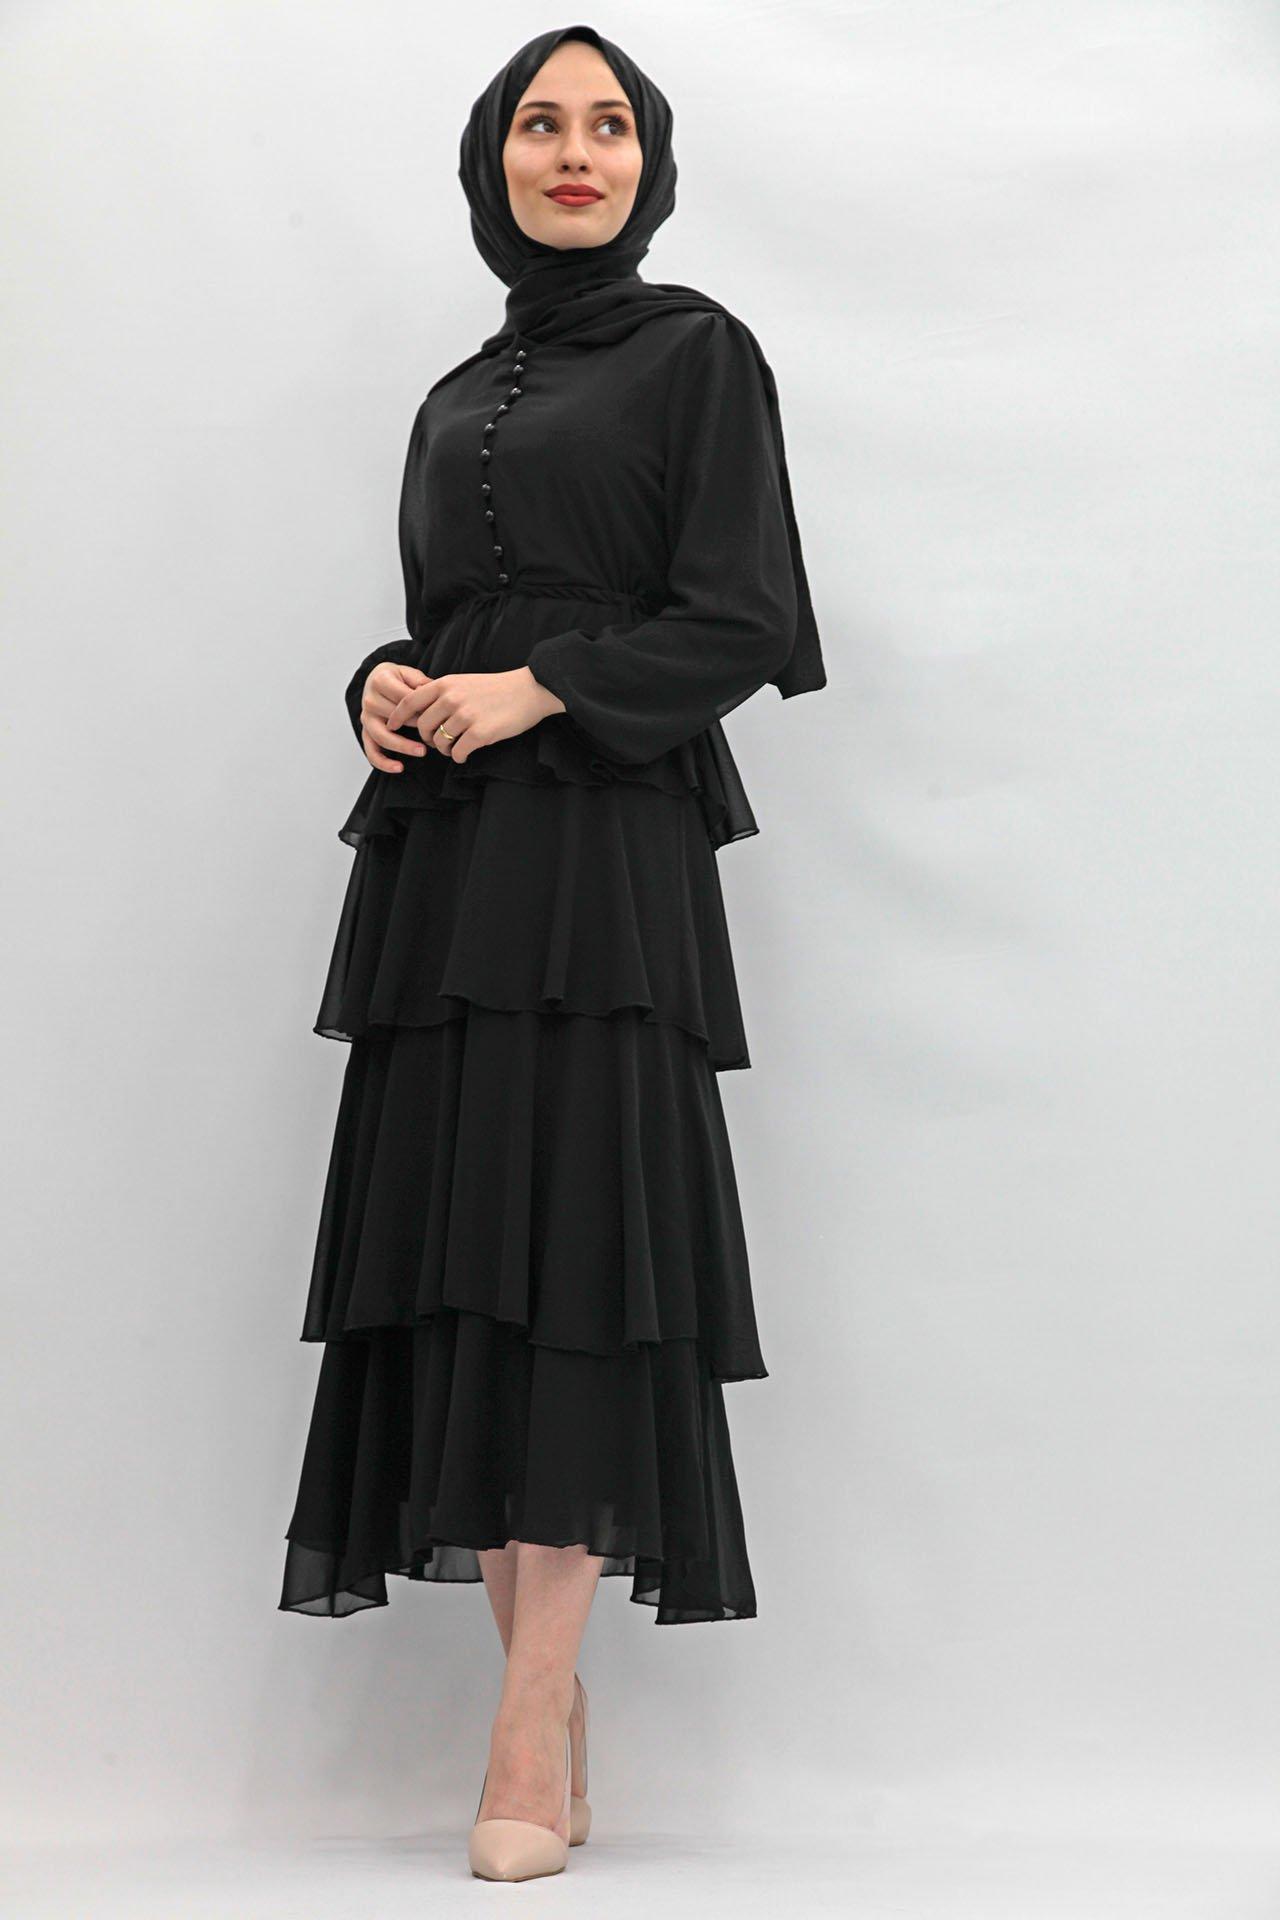 GİZAGİYİM - Önü Düğmeli Kat Kat Elbise Siyah